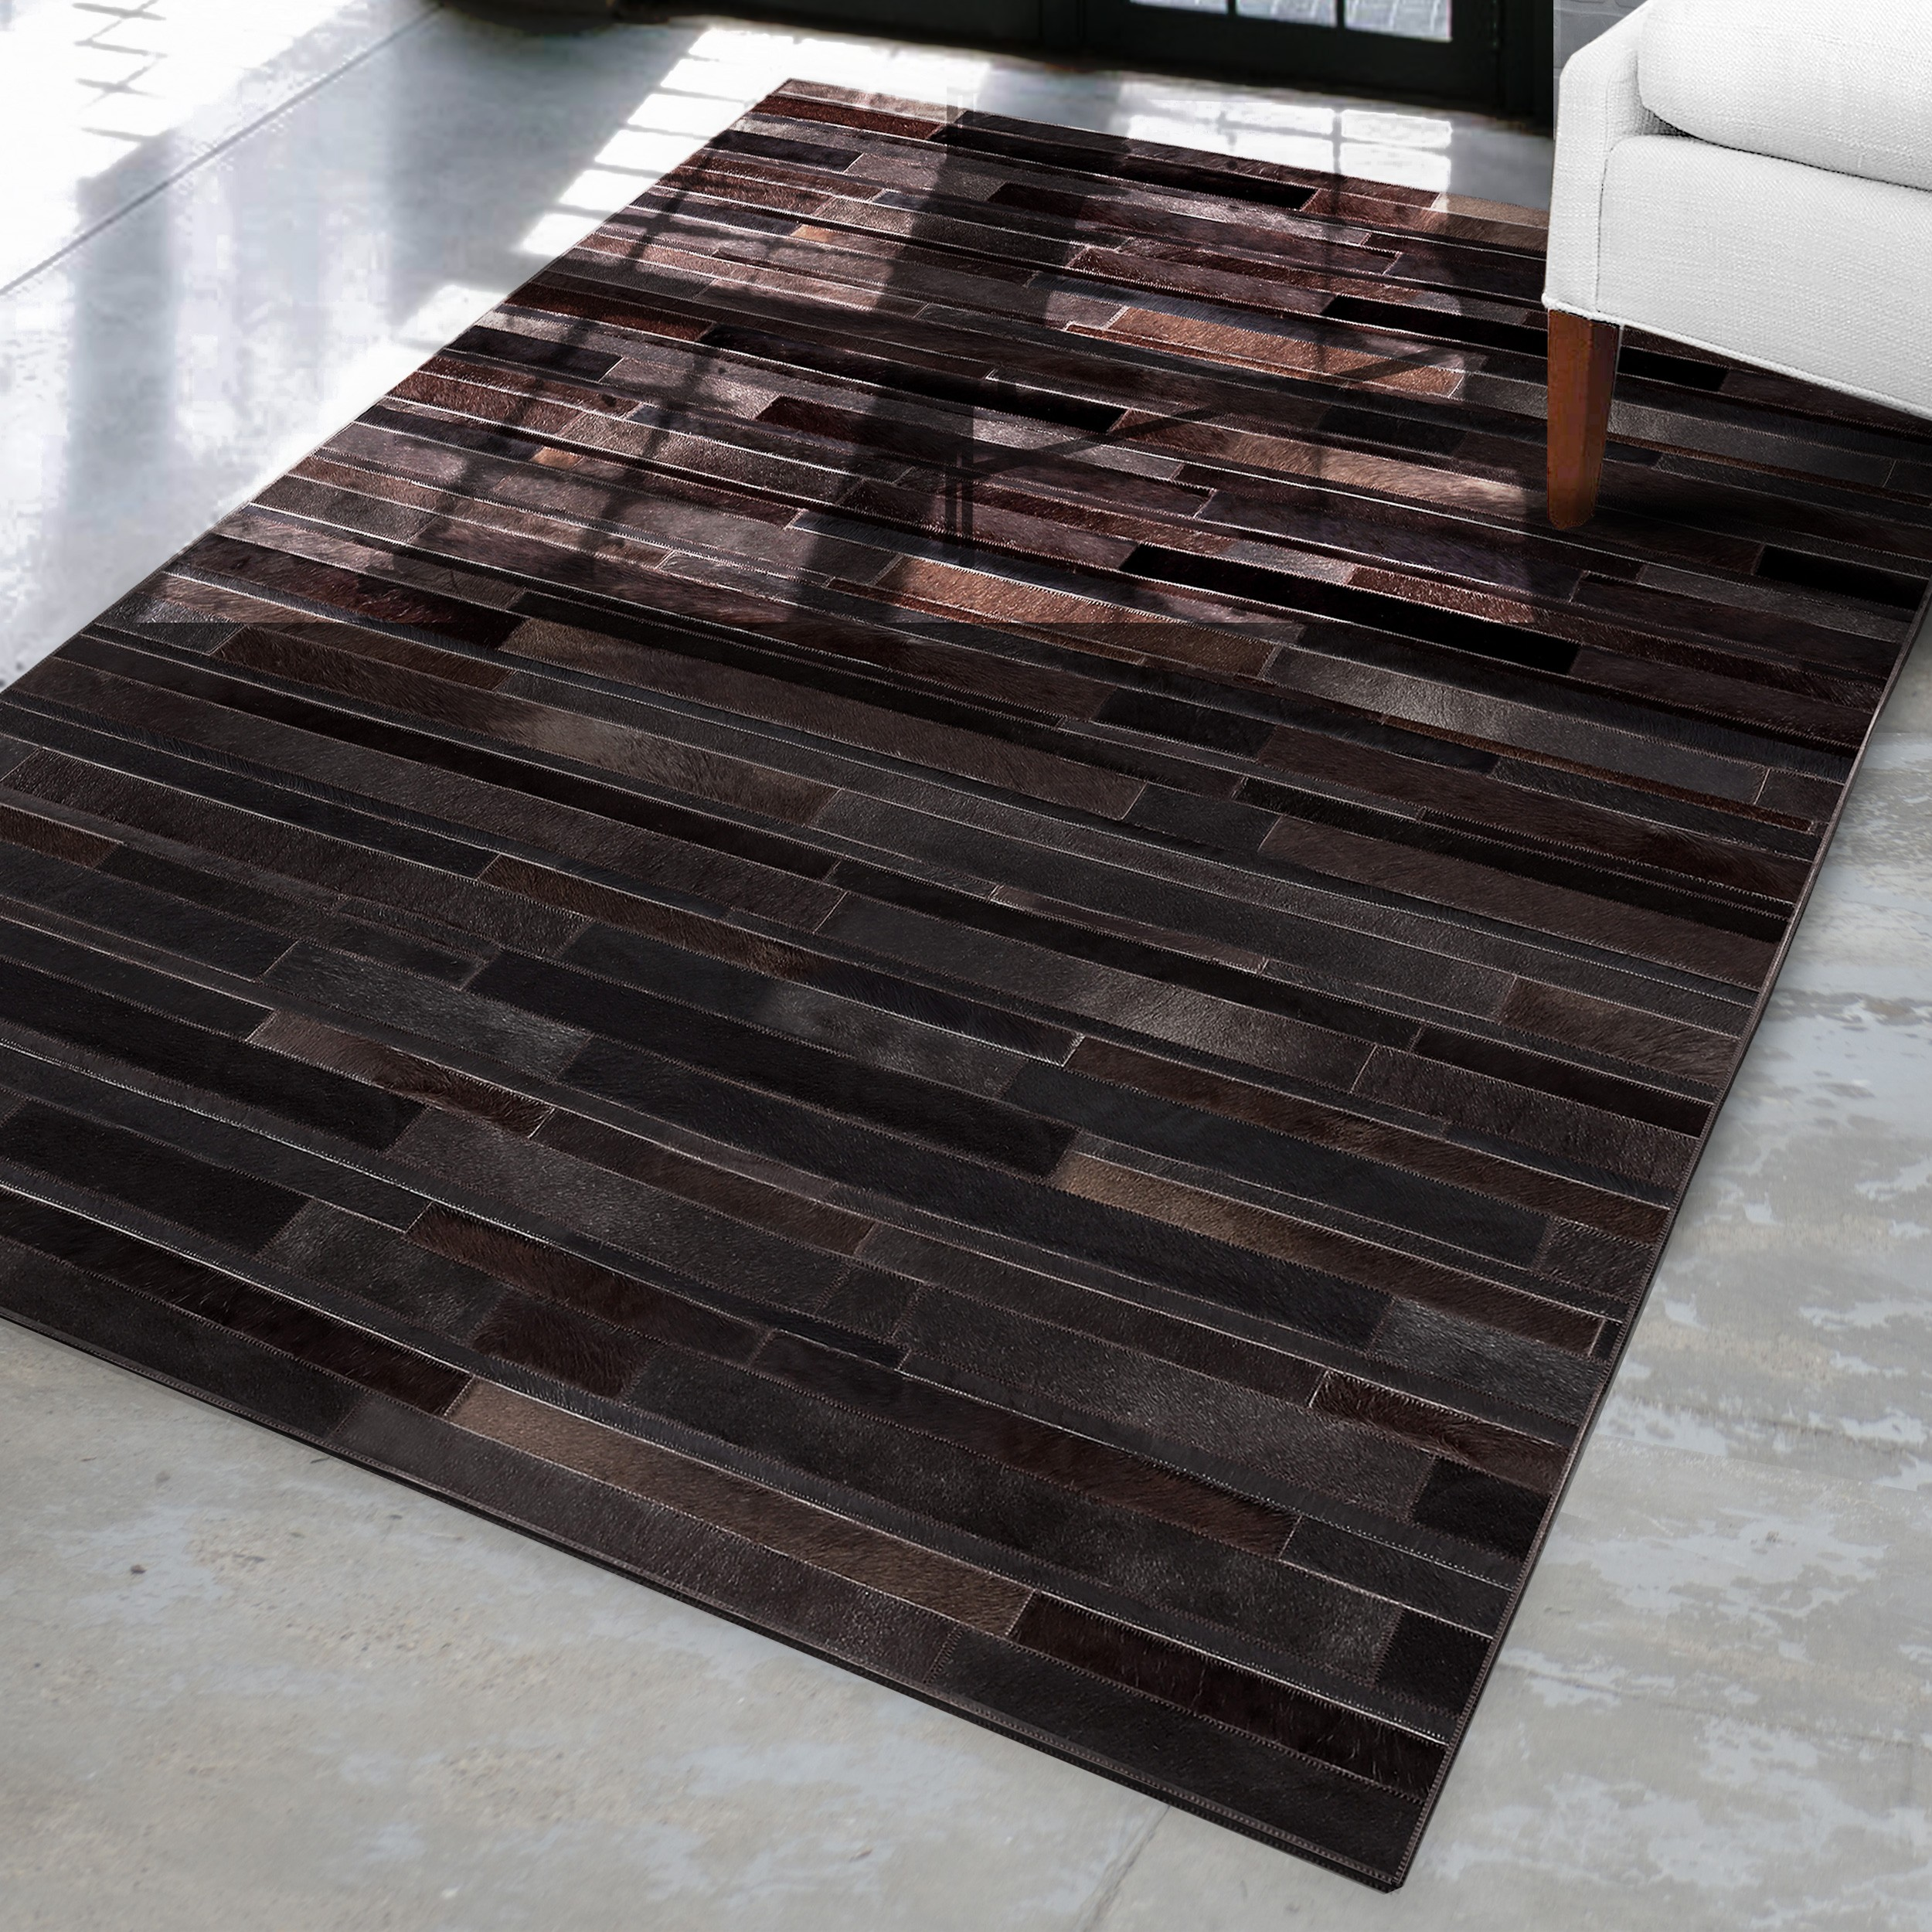 acheter tapis cuir marron - Tapis 200x300